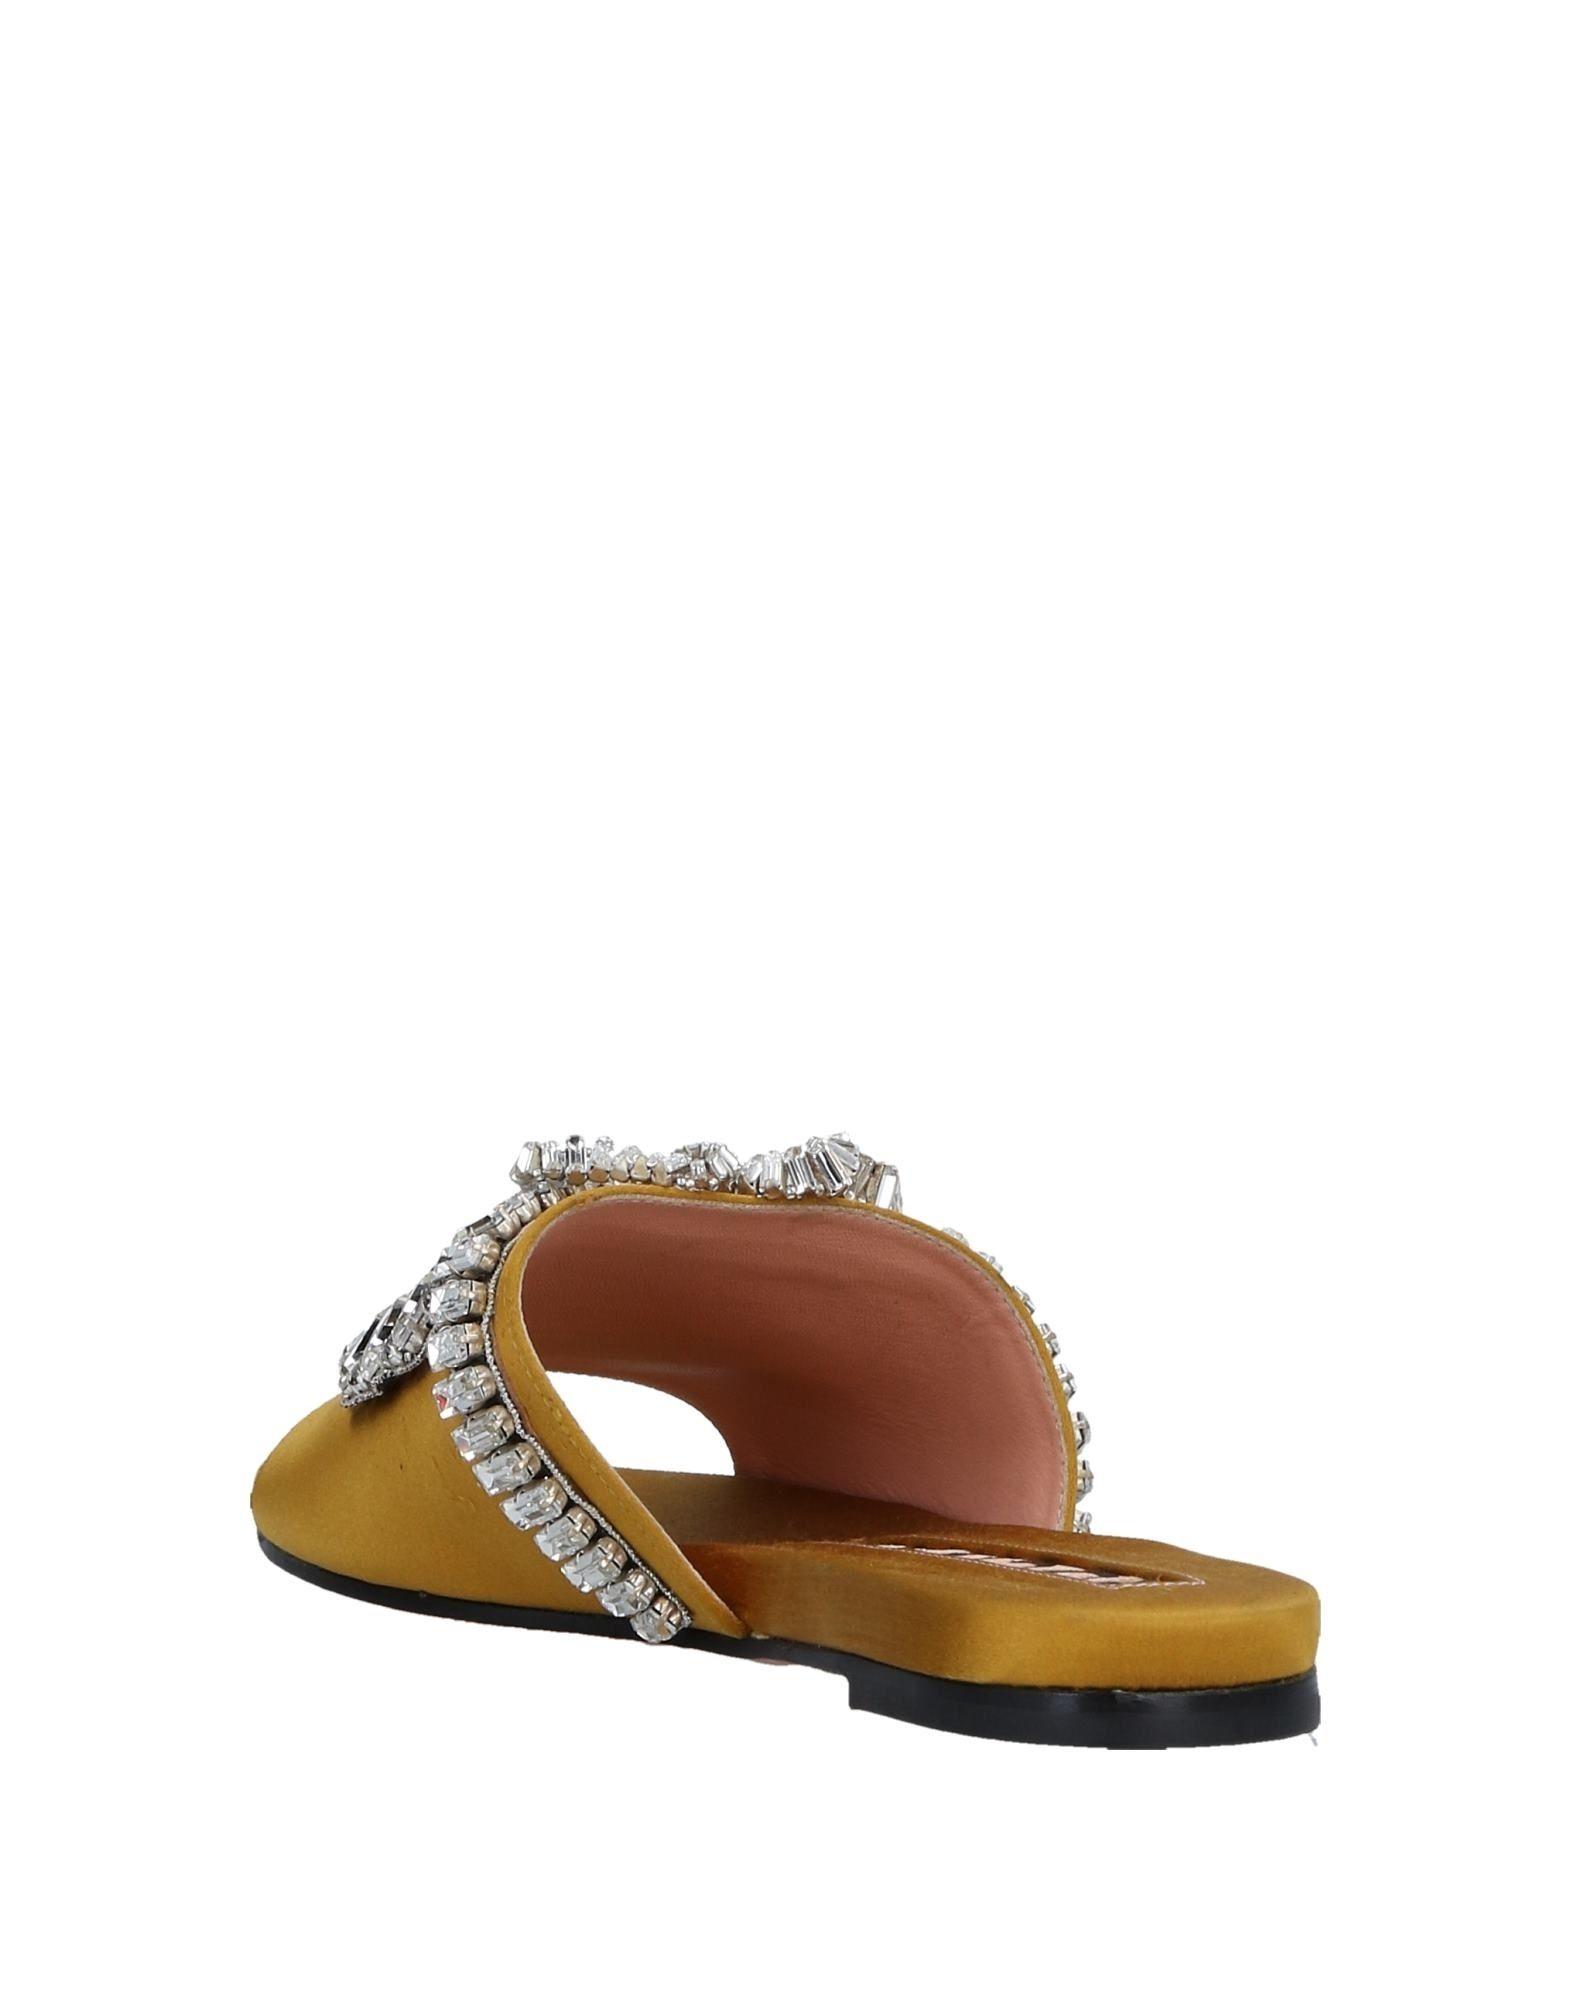 Sandali - Rochas Donna - Sandali 11543746DR elegante 9c28f5